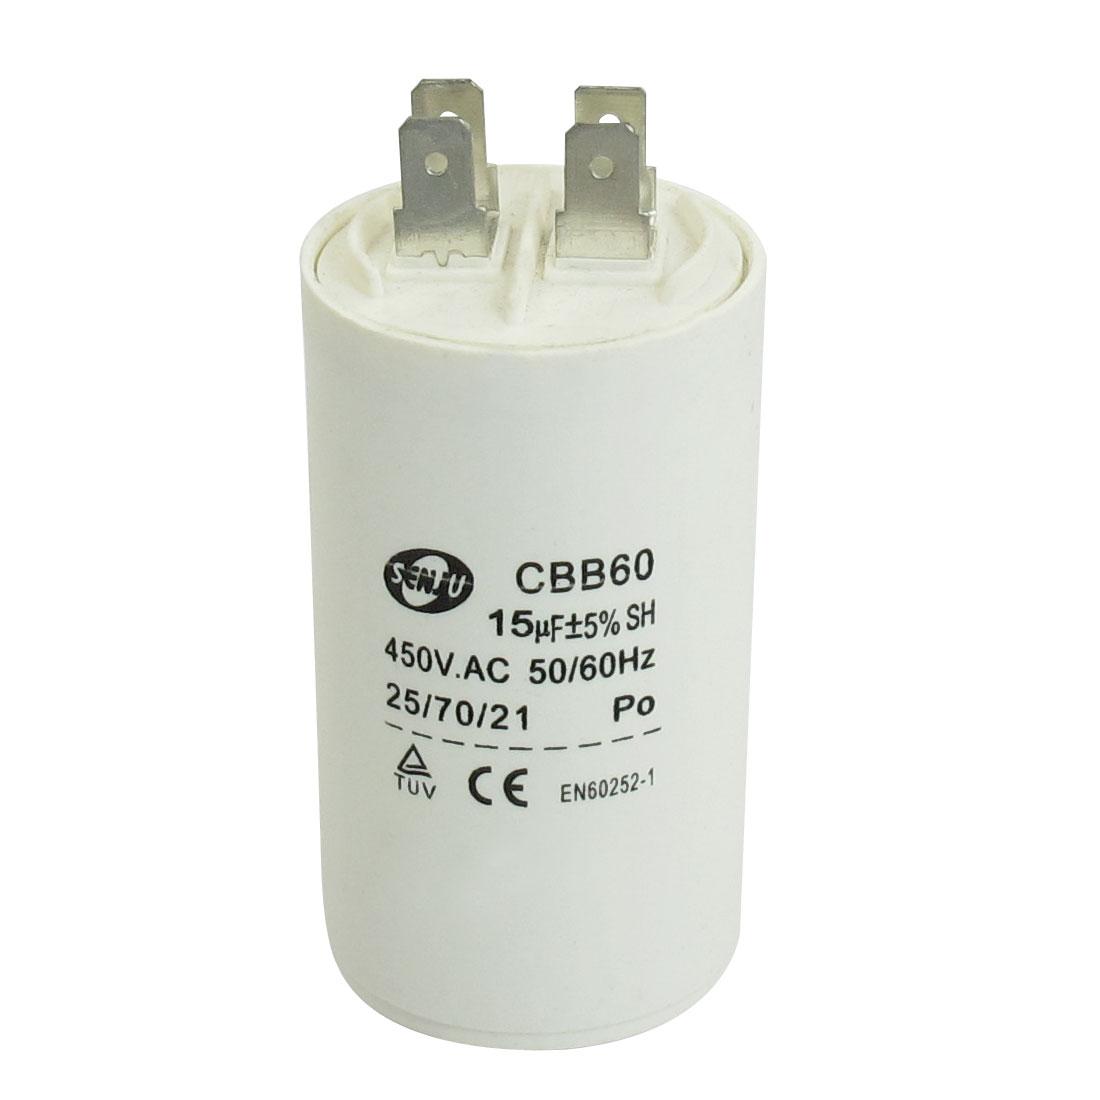 CBB60 Cylinder Shaped 450V AC Nonpolar Motor Running Capacitor 15uF